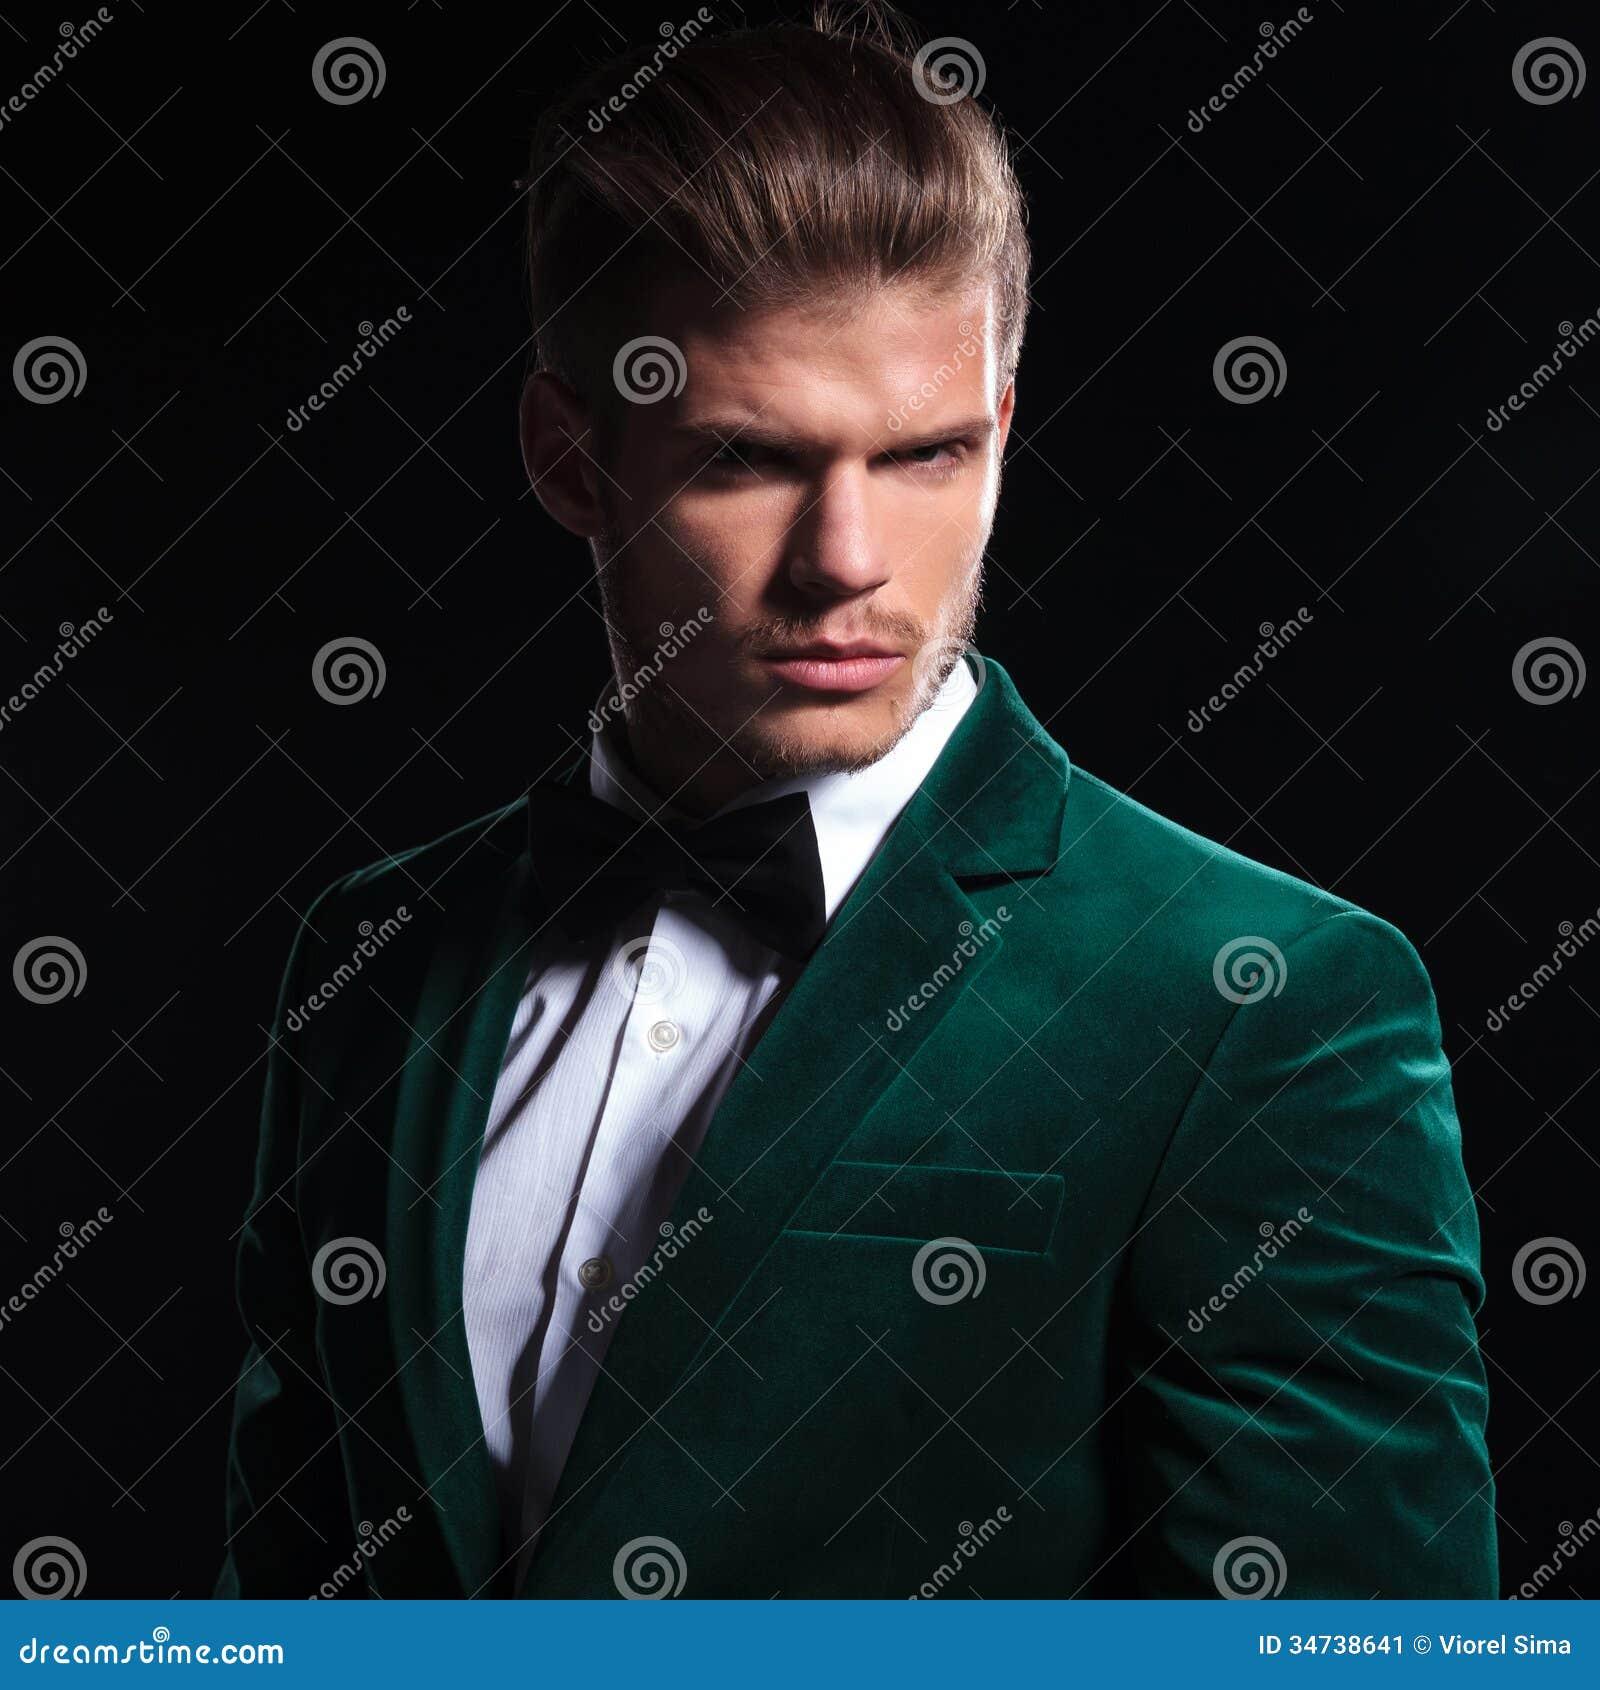 black suit dark green tie - photo #8